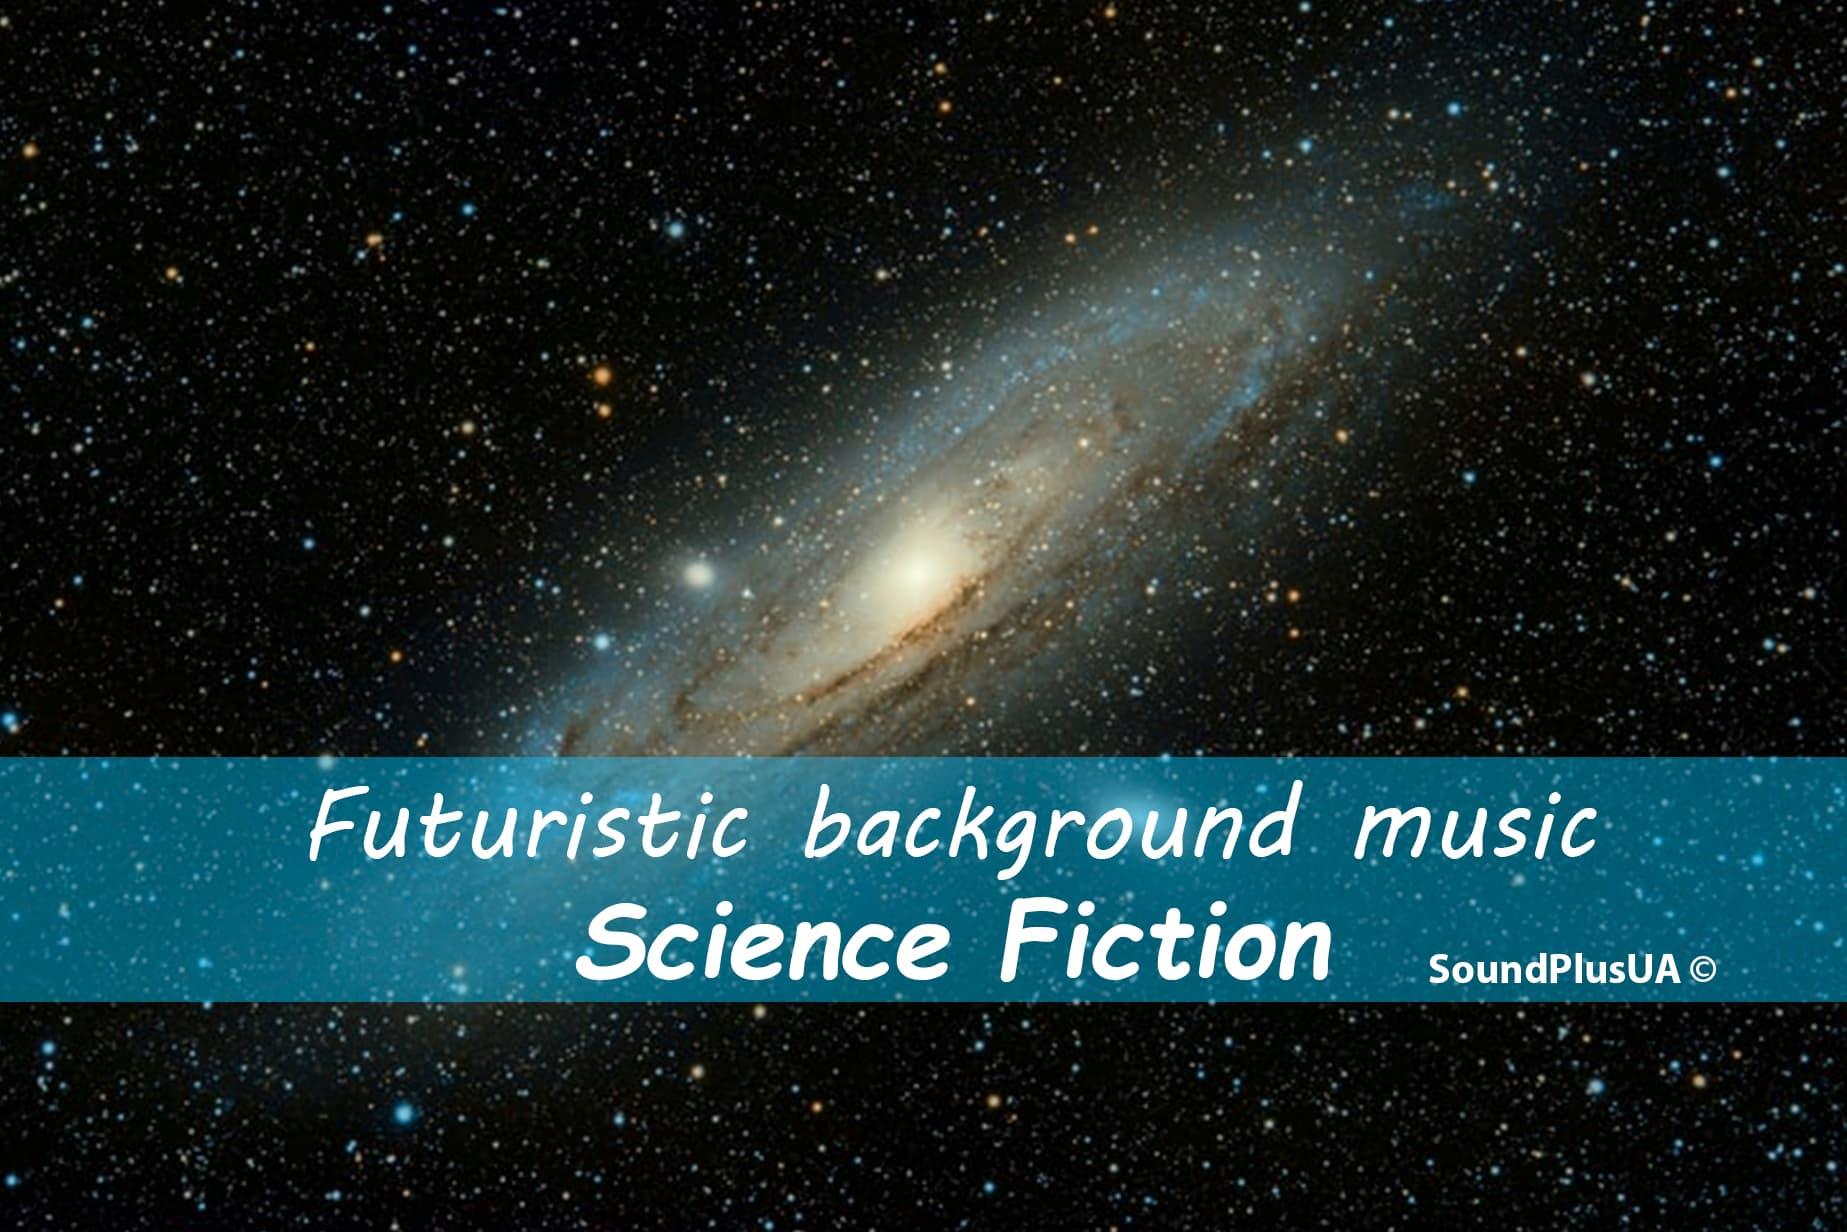 Futuristic Science Fiction Background Music